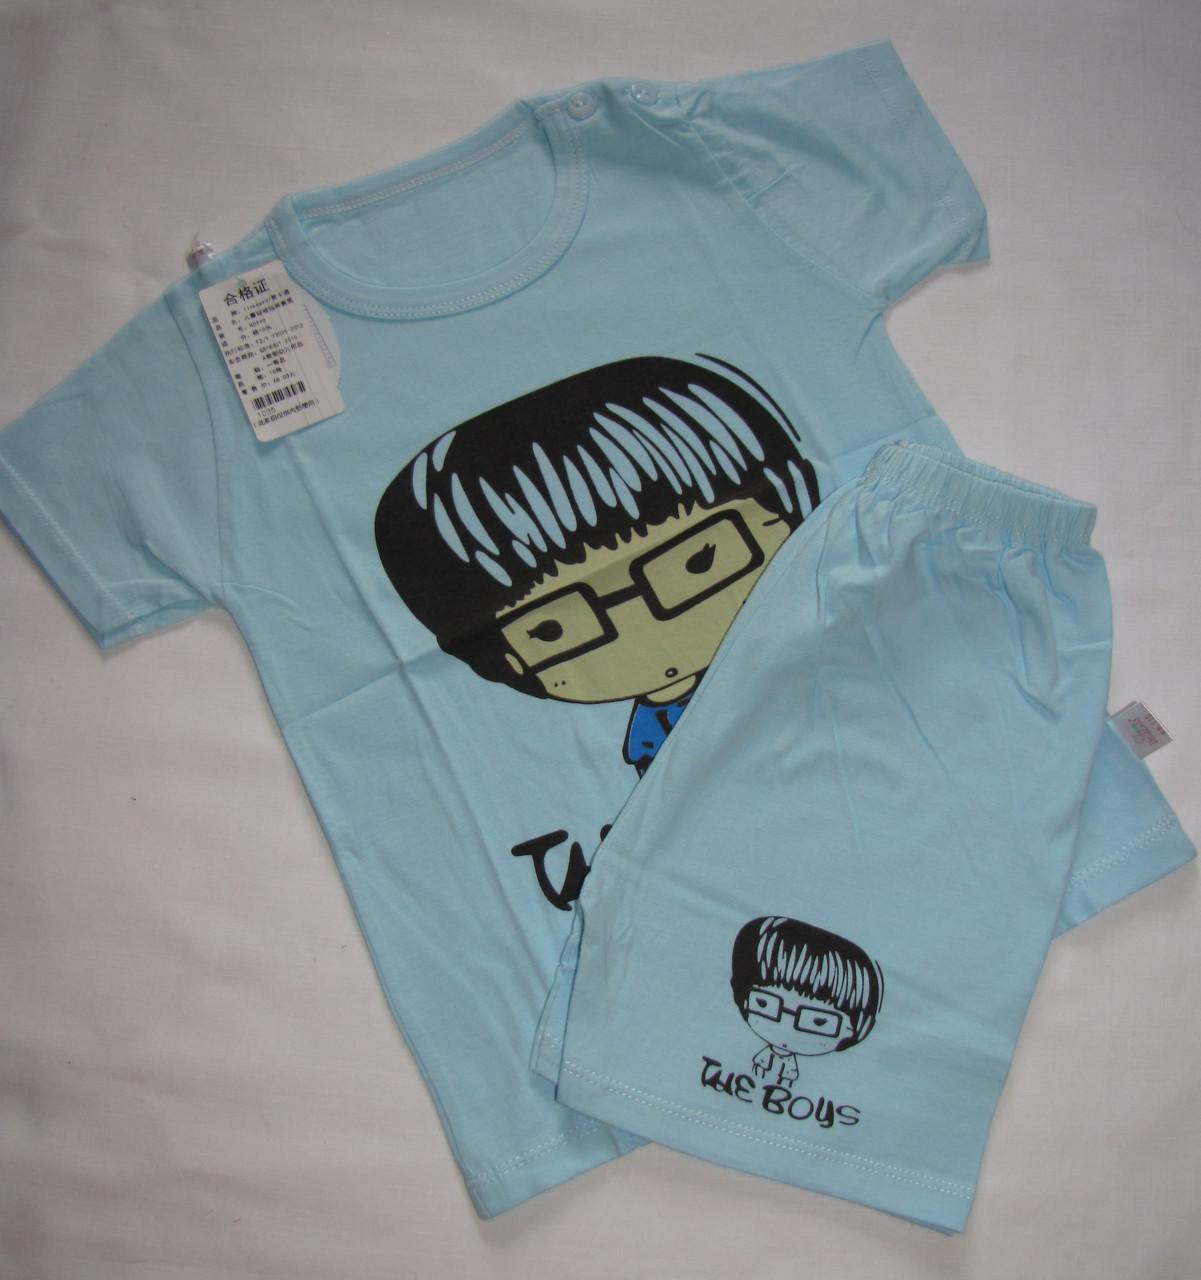 Пижама футболка с короткими рукавами и шорты Linkcard Умничка рост 110 см голубая 06121